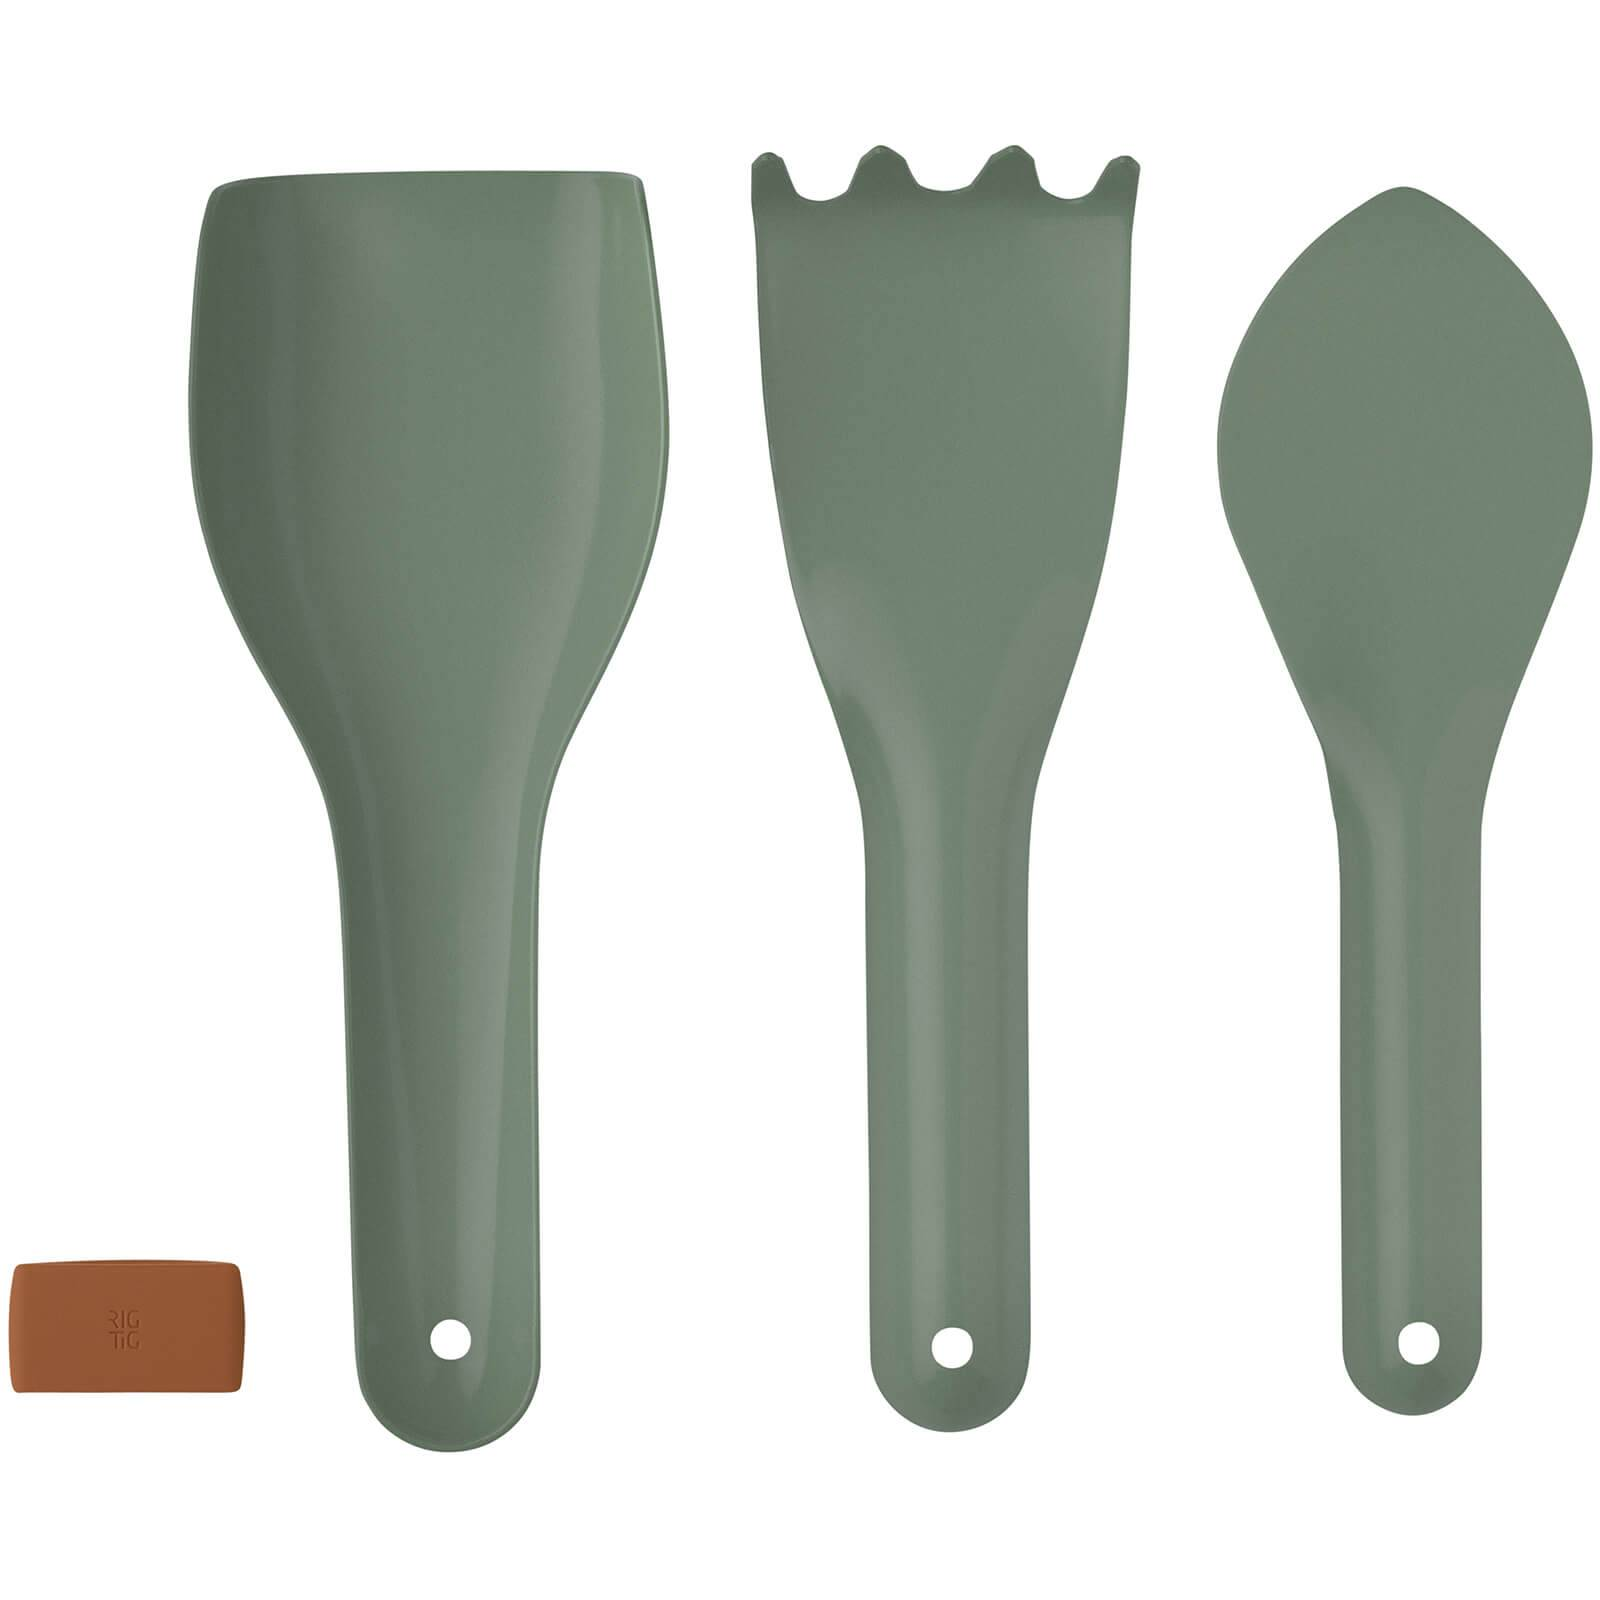 RIG-TIG Green-It Gardening Tools - Set of 3 - Green